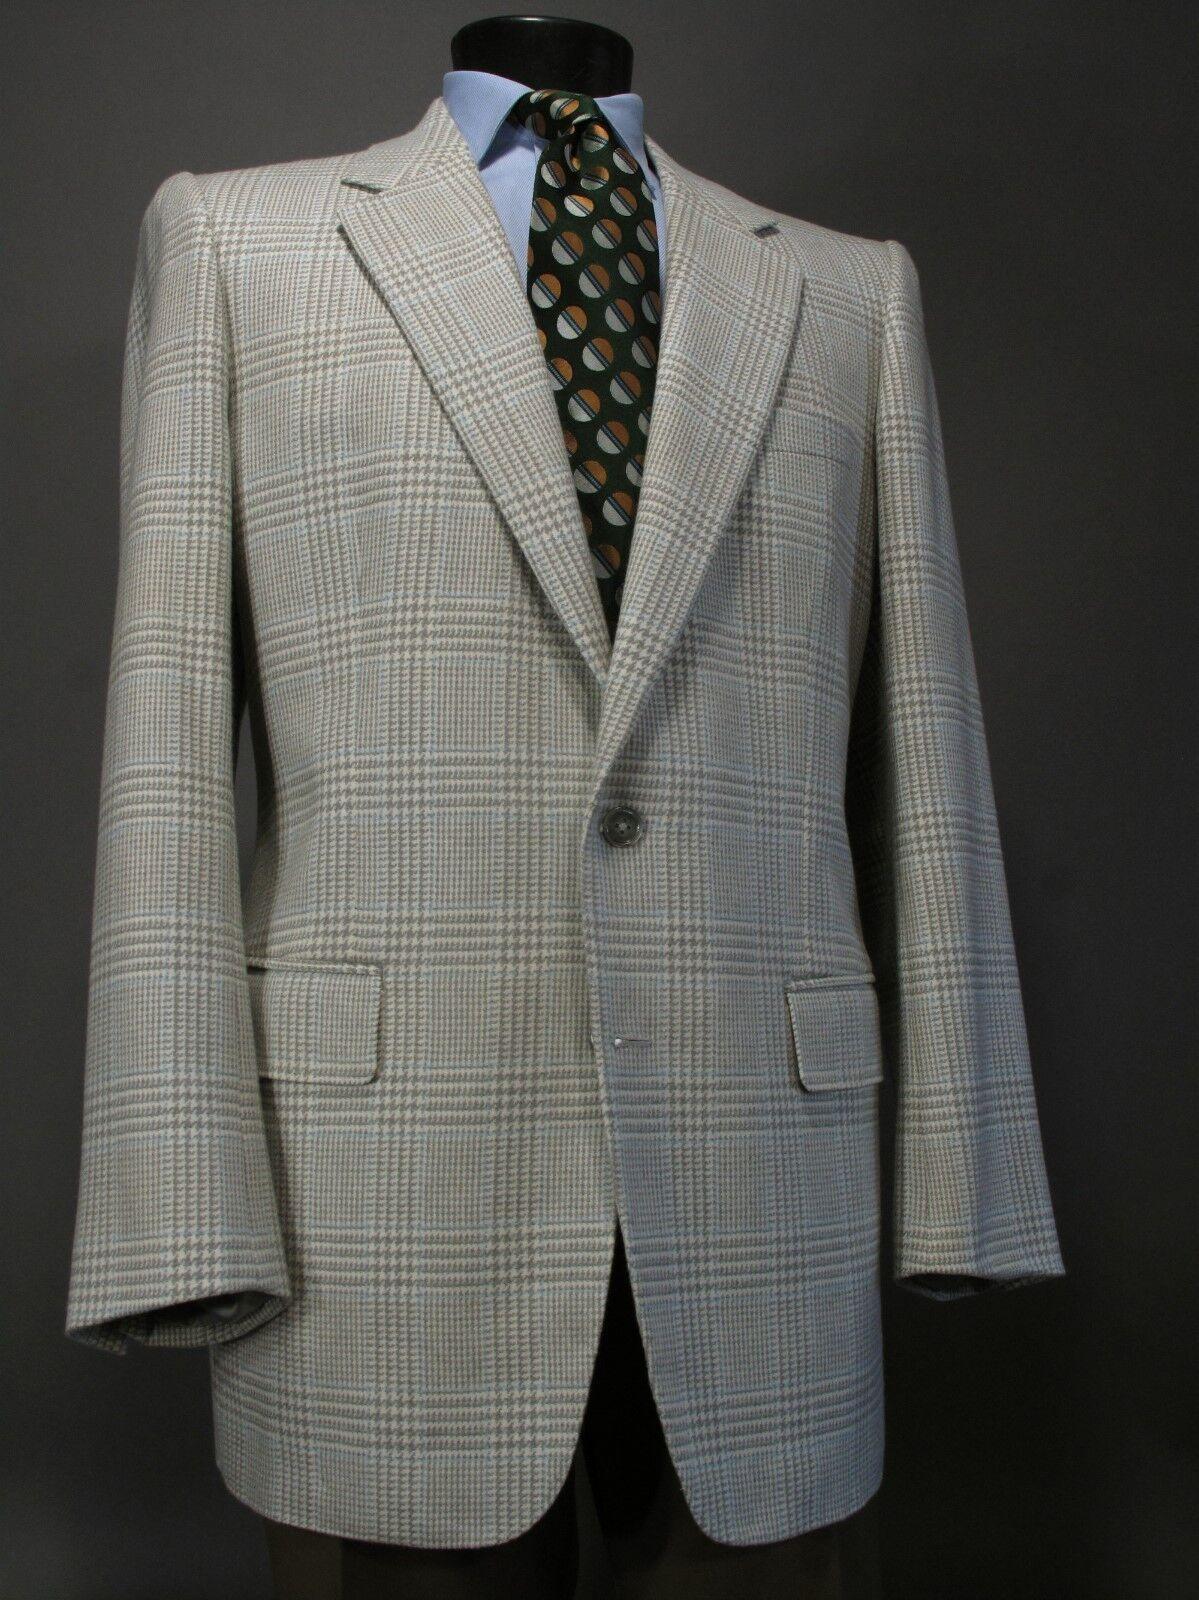 WILLIAM YU Bespoke Cashmere Sport Coat 44 L, Beige Plaid 2 Button